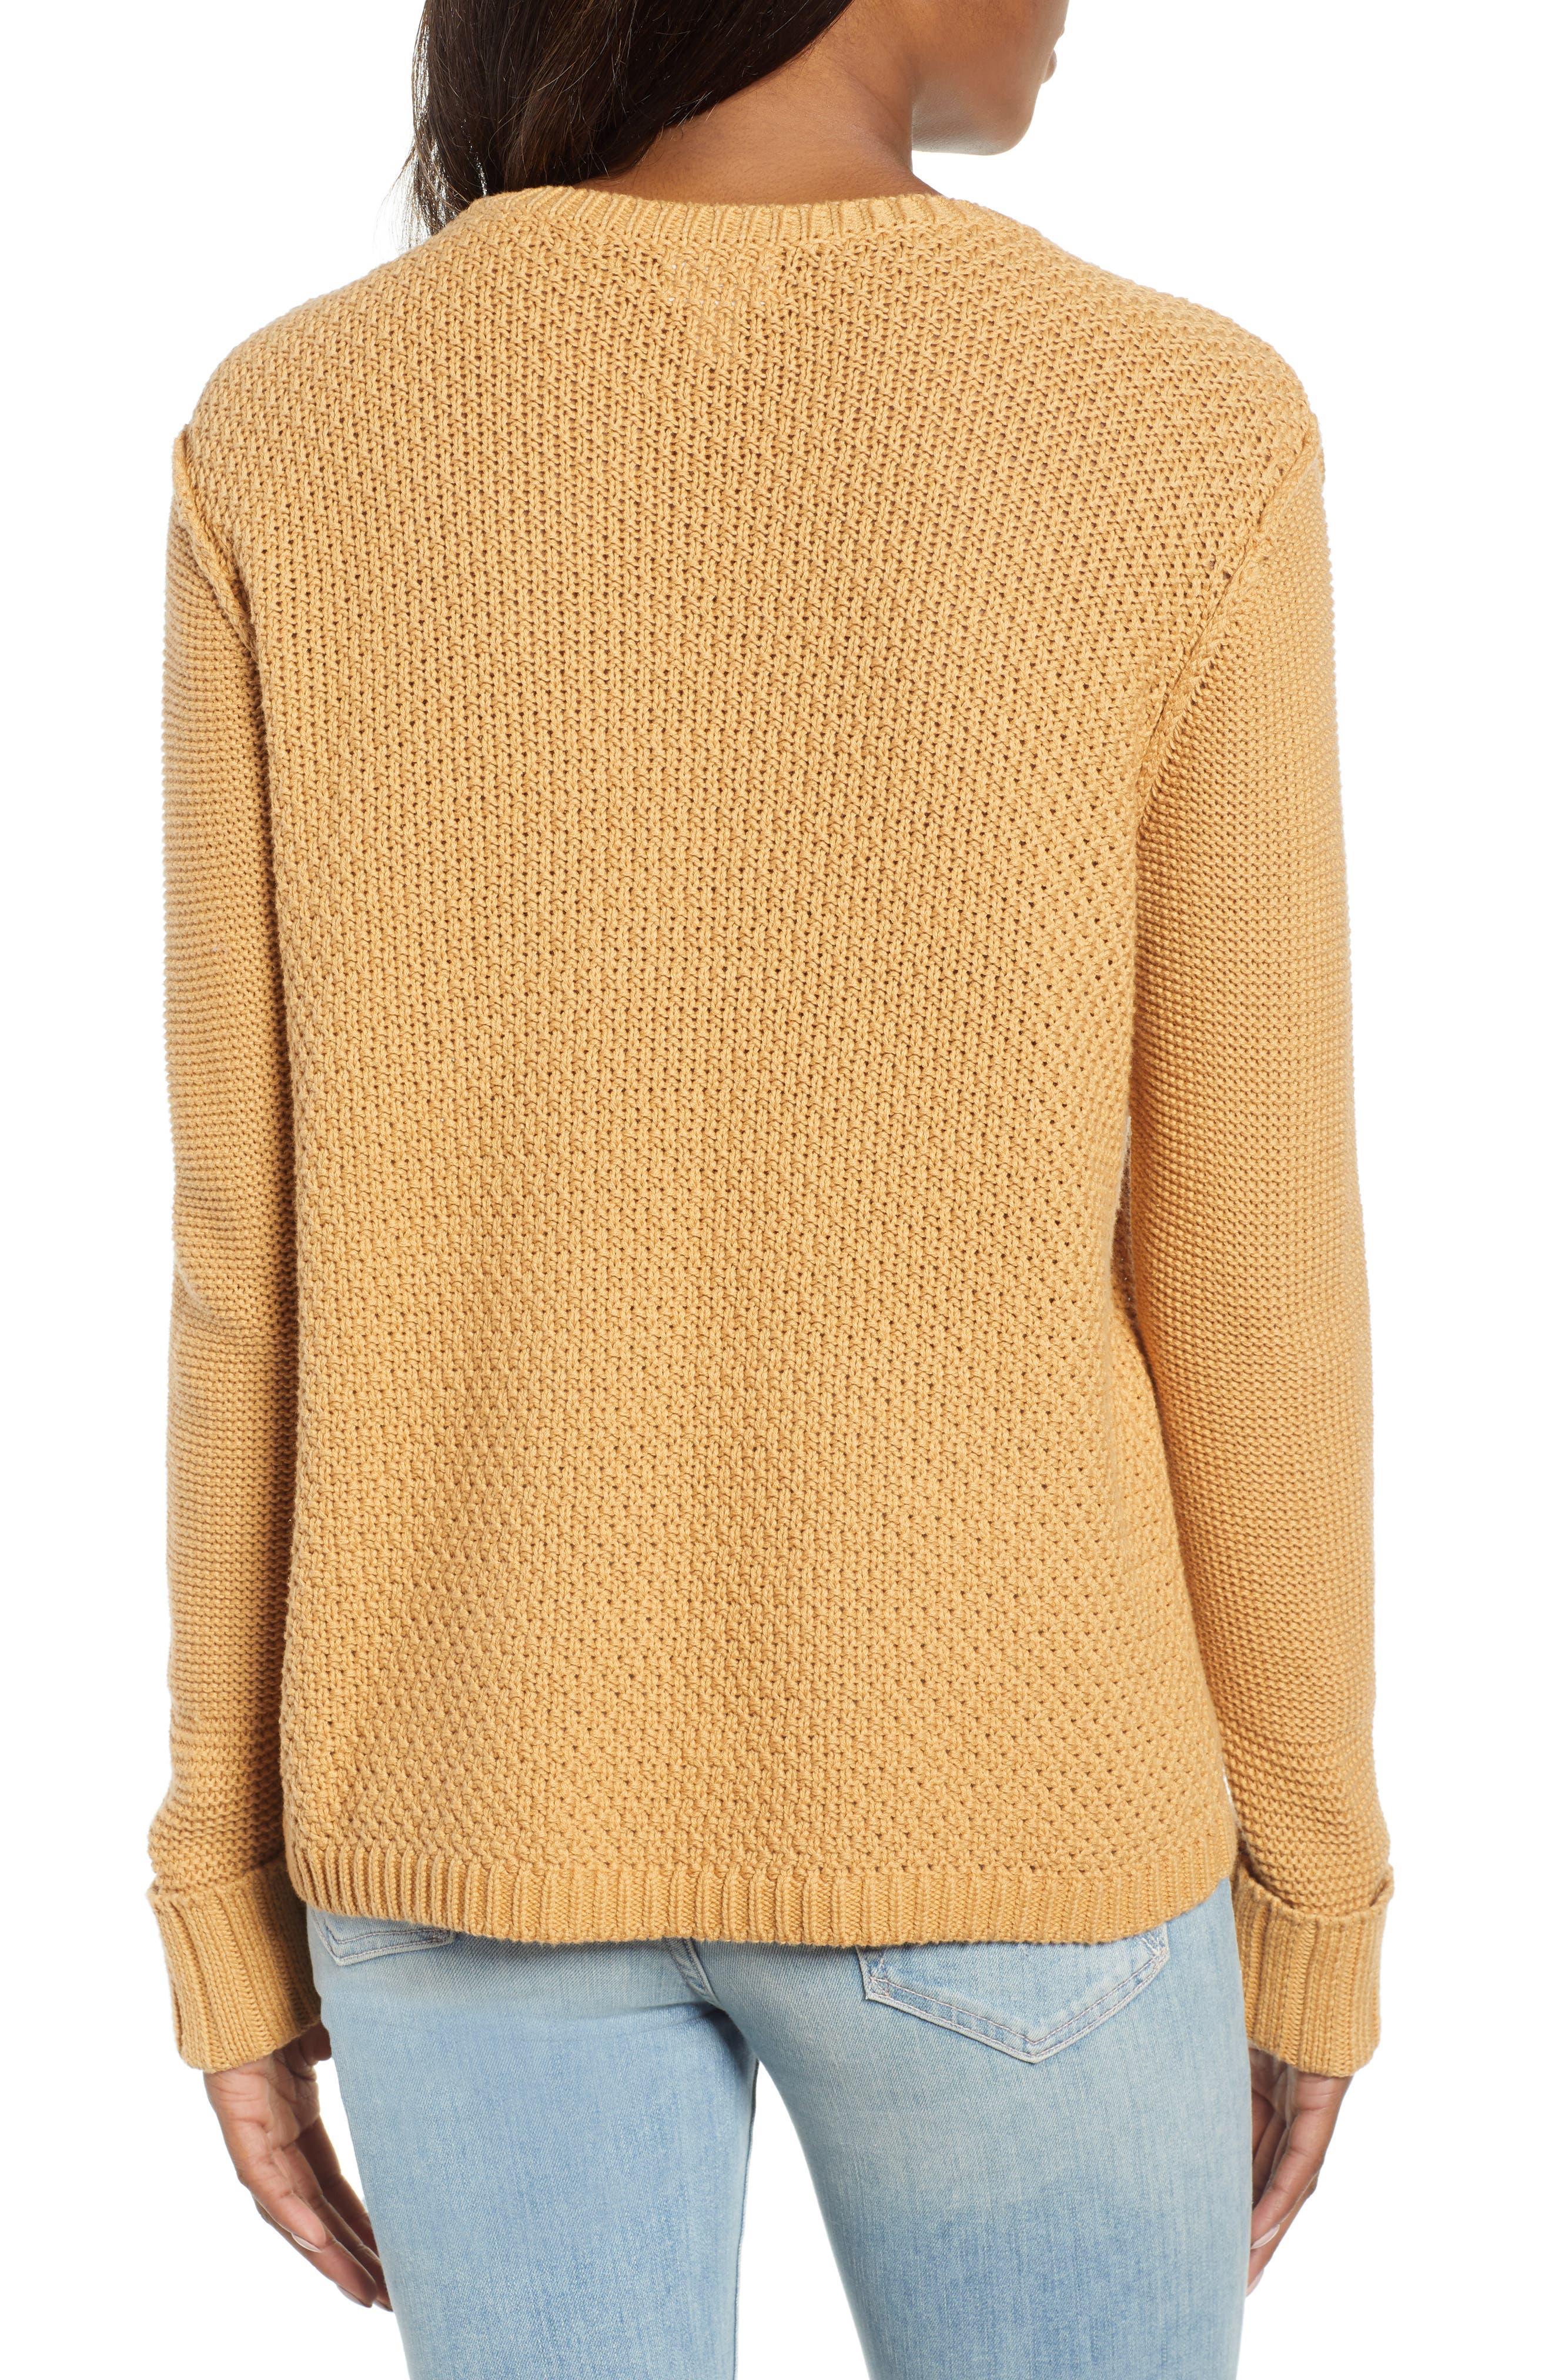 CASLON<SUP>®</SUP>, Mixed Stitch Sweater, Alternate thumbnail 2, color, TAN CINNAMON